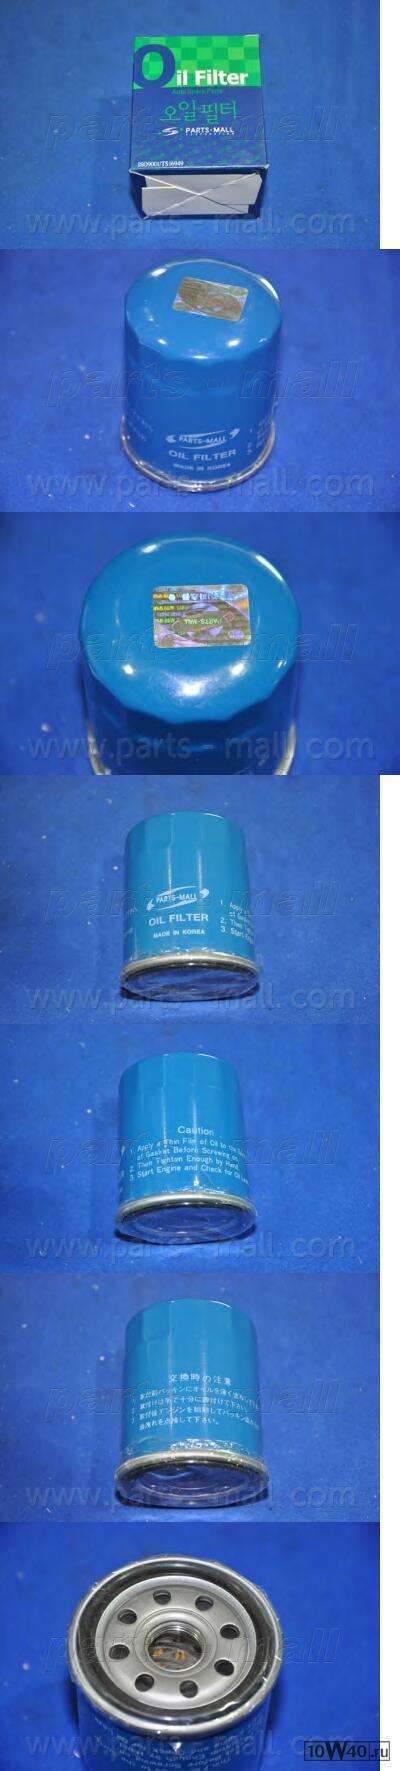 фильтр масляный\ suzuki liana 1.3 / 1.6 02-08 / ignis 1.3 / 1.5 03> / jimny 1.3 16v 98>